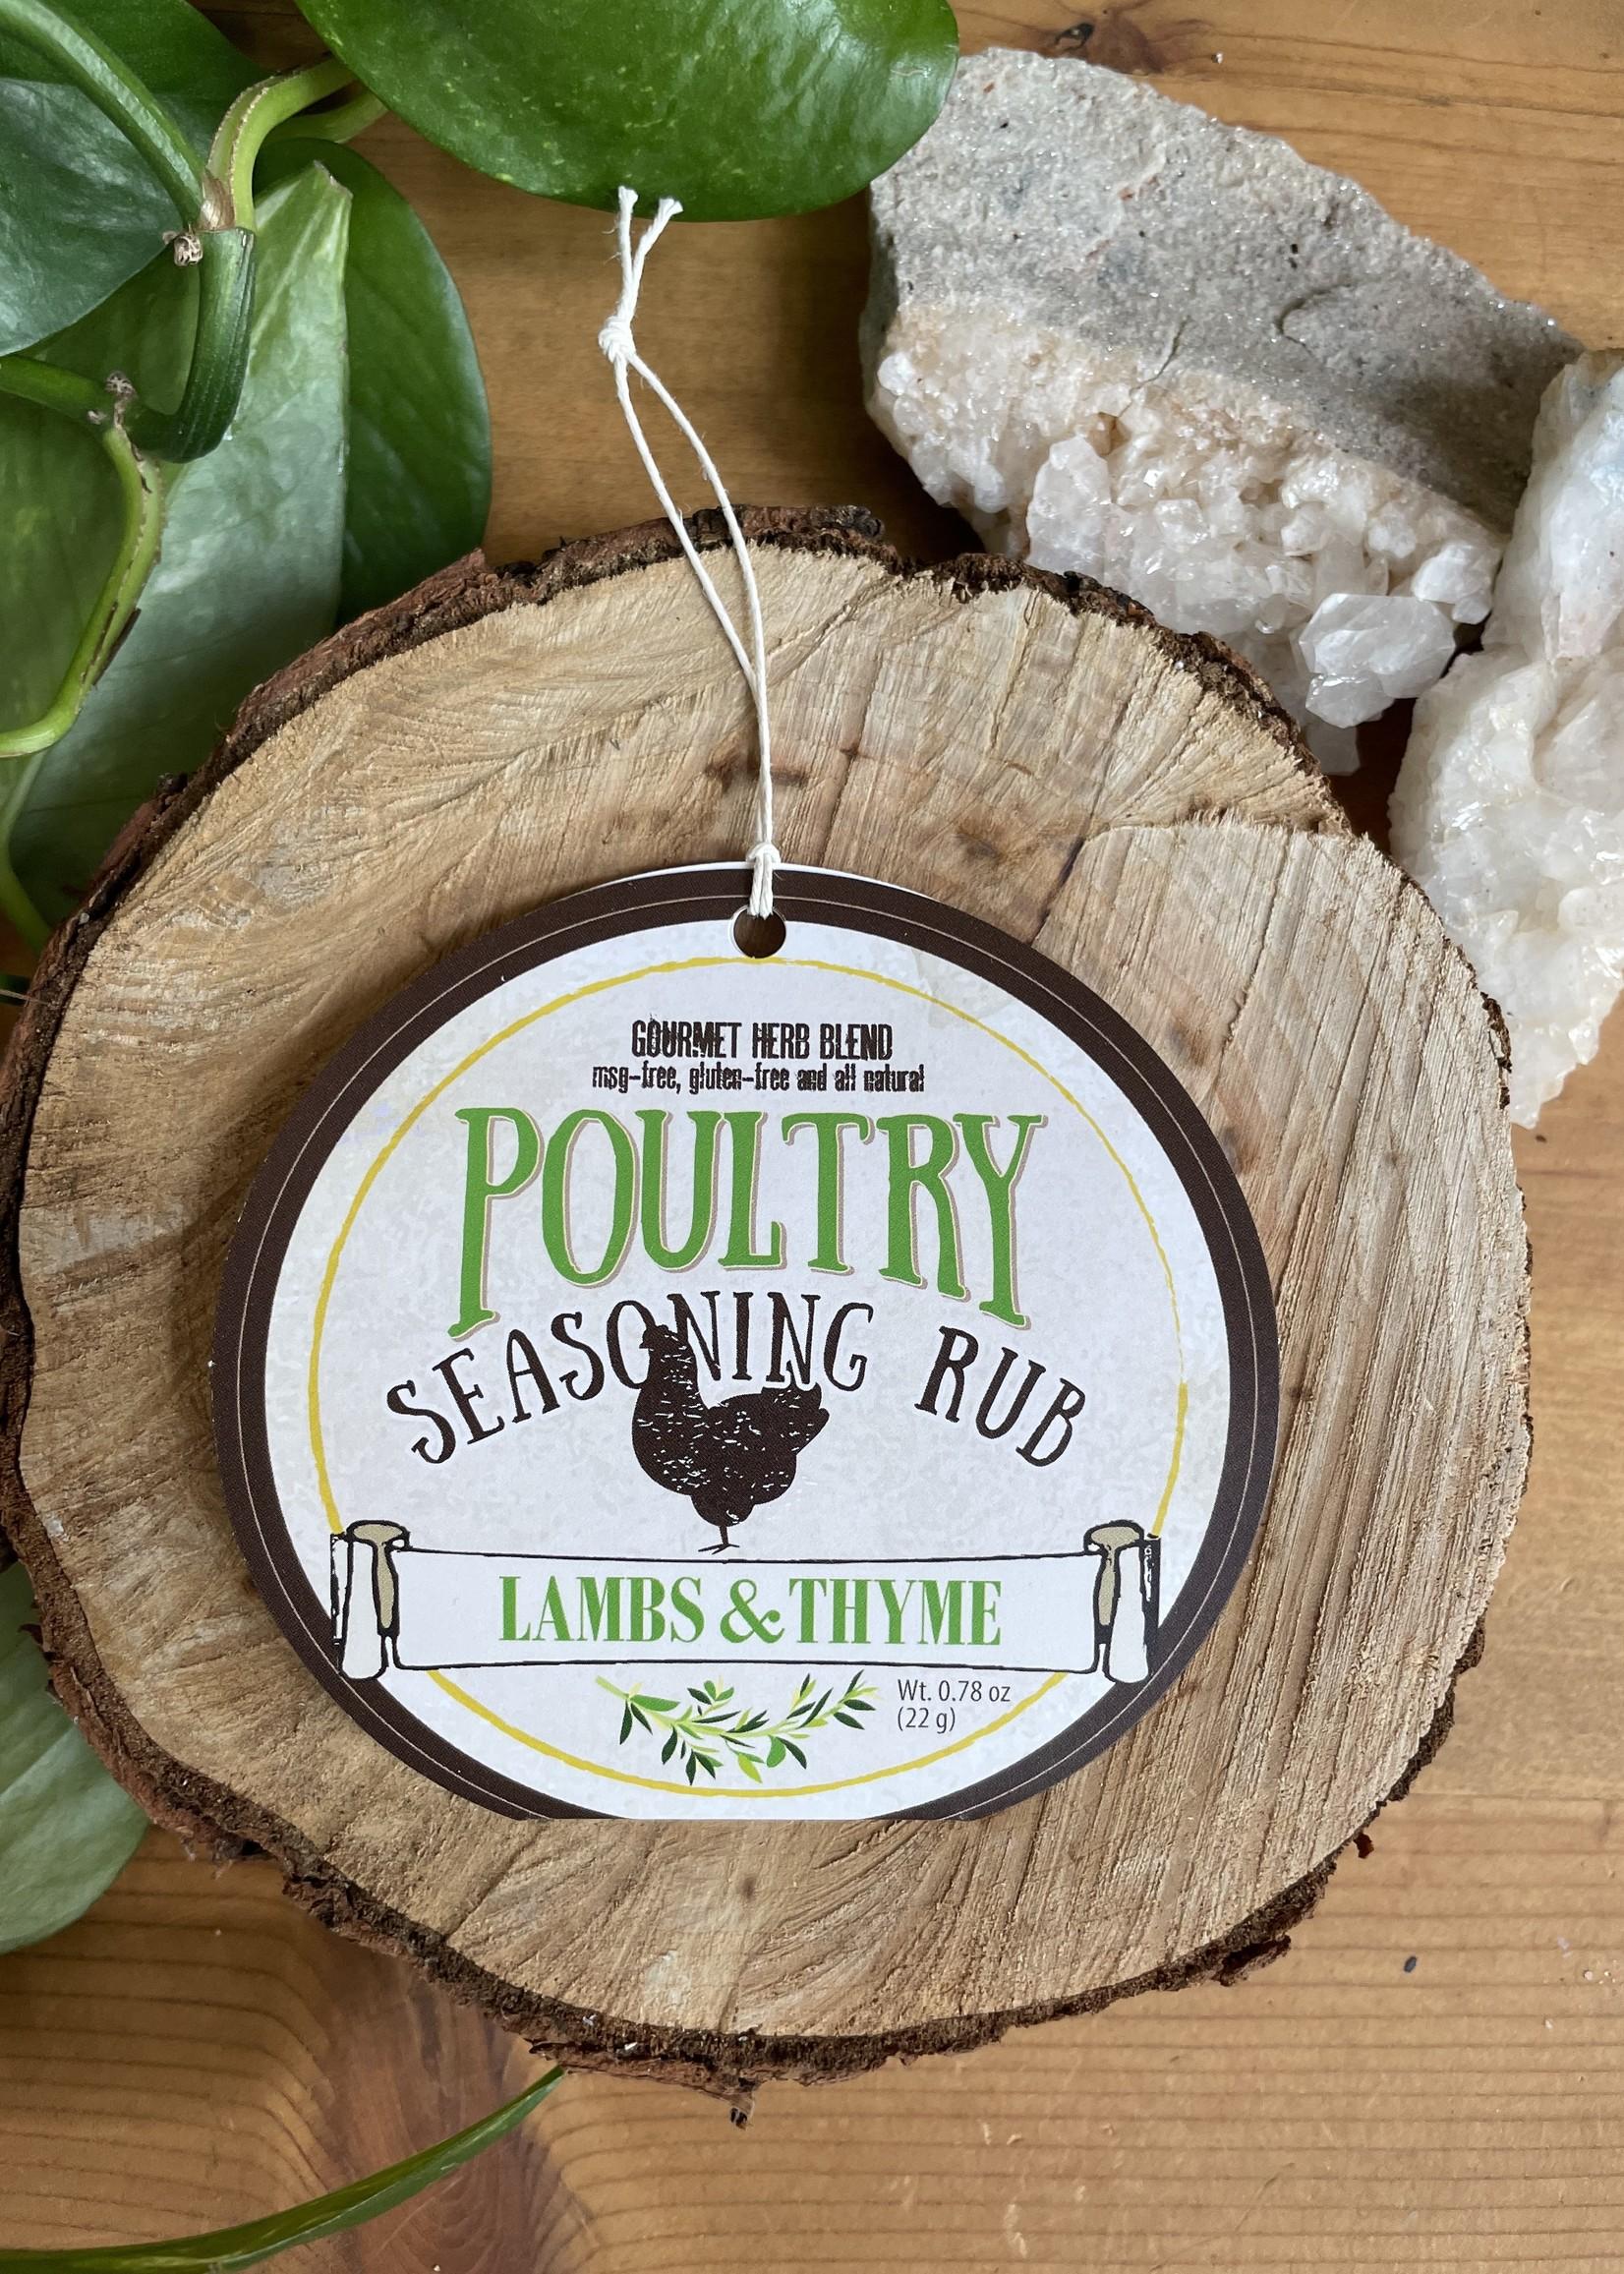 Lambs & Thyme Seasoning Rub